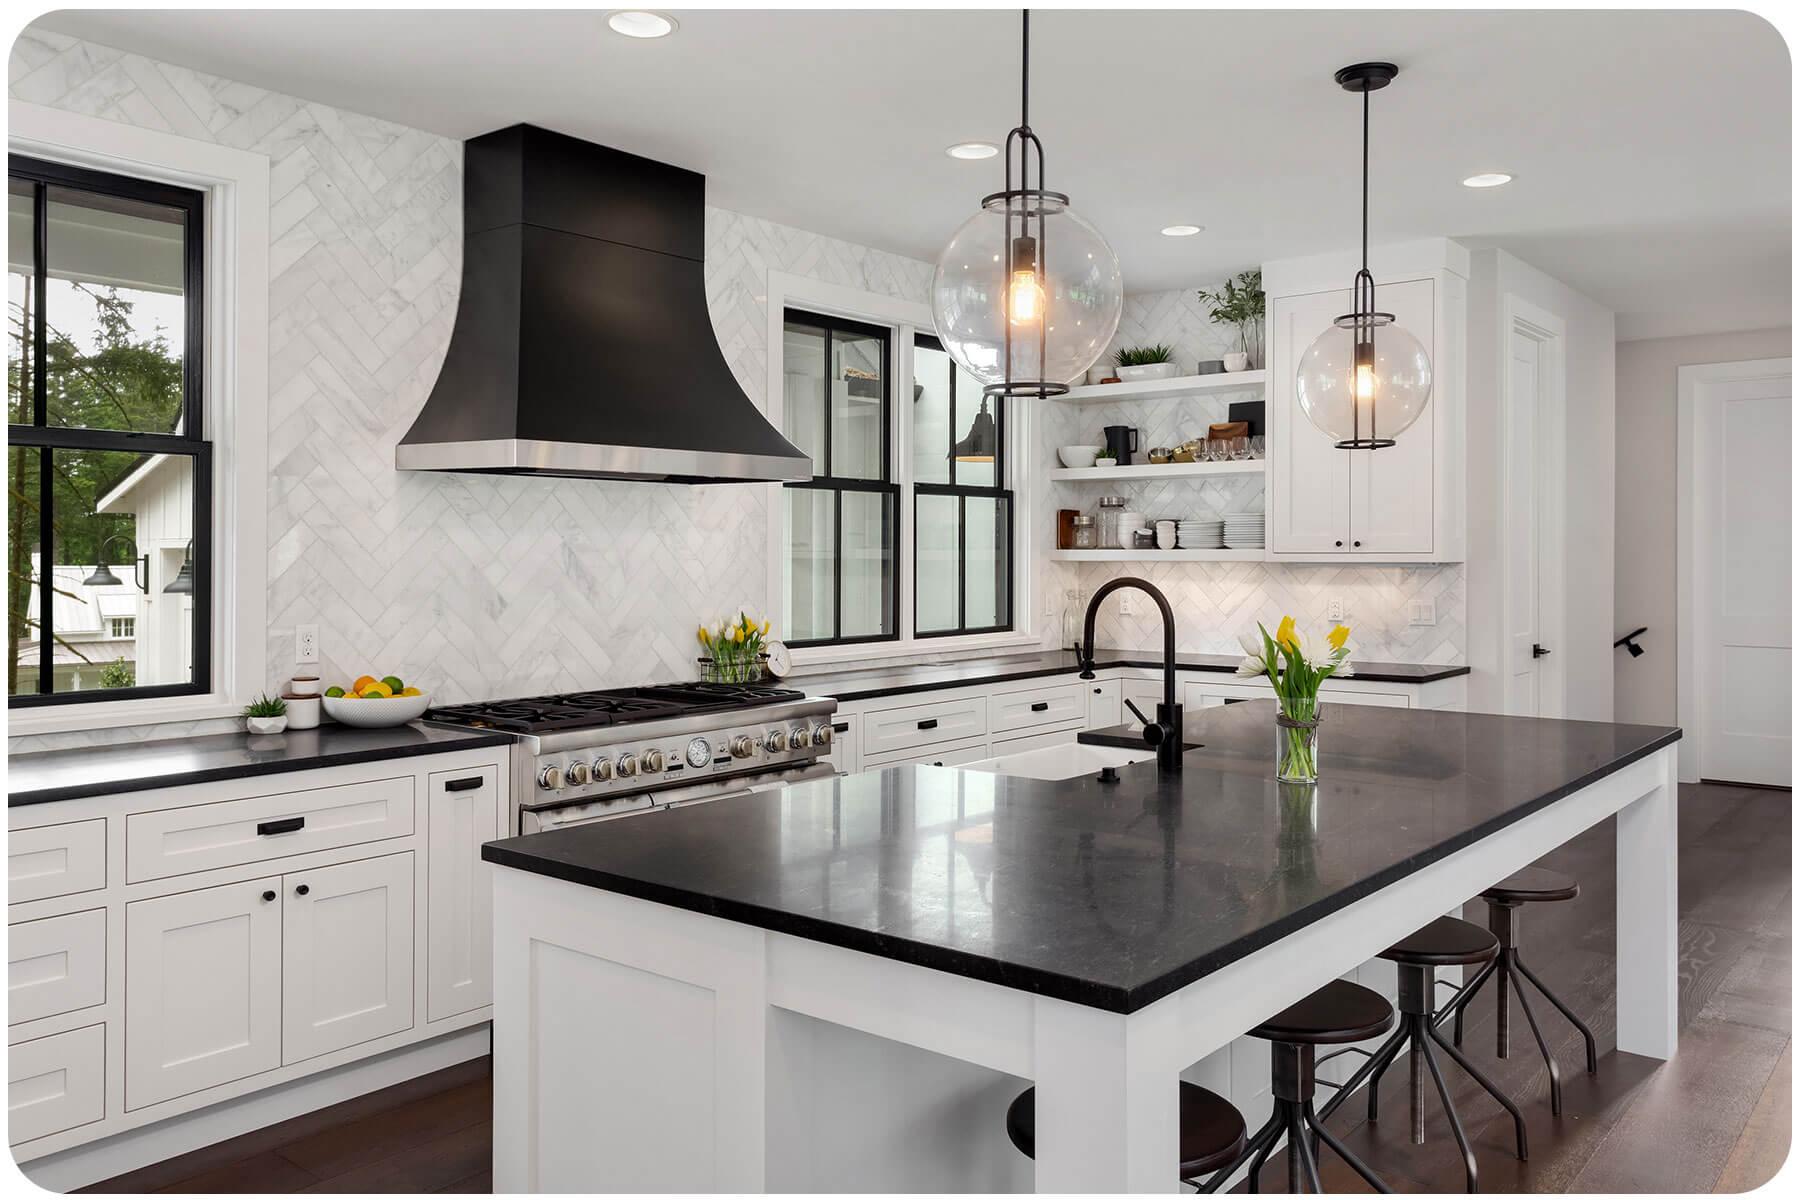 Kitchen Remodeling Services Miami | 305 Florida Contractors